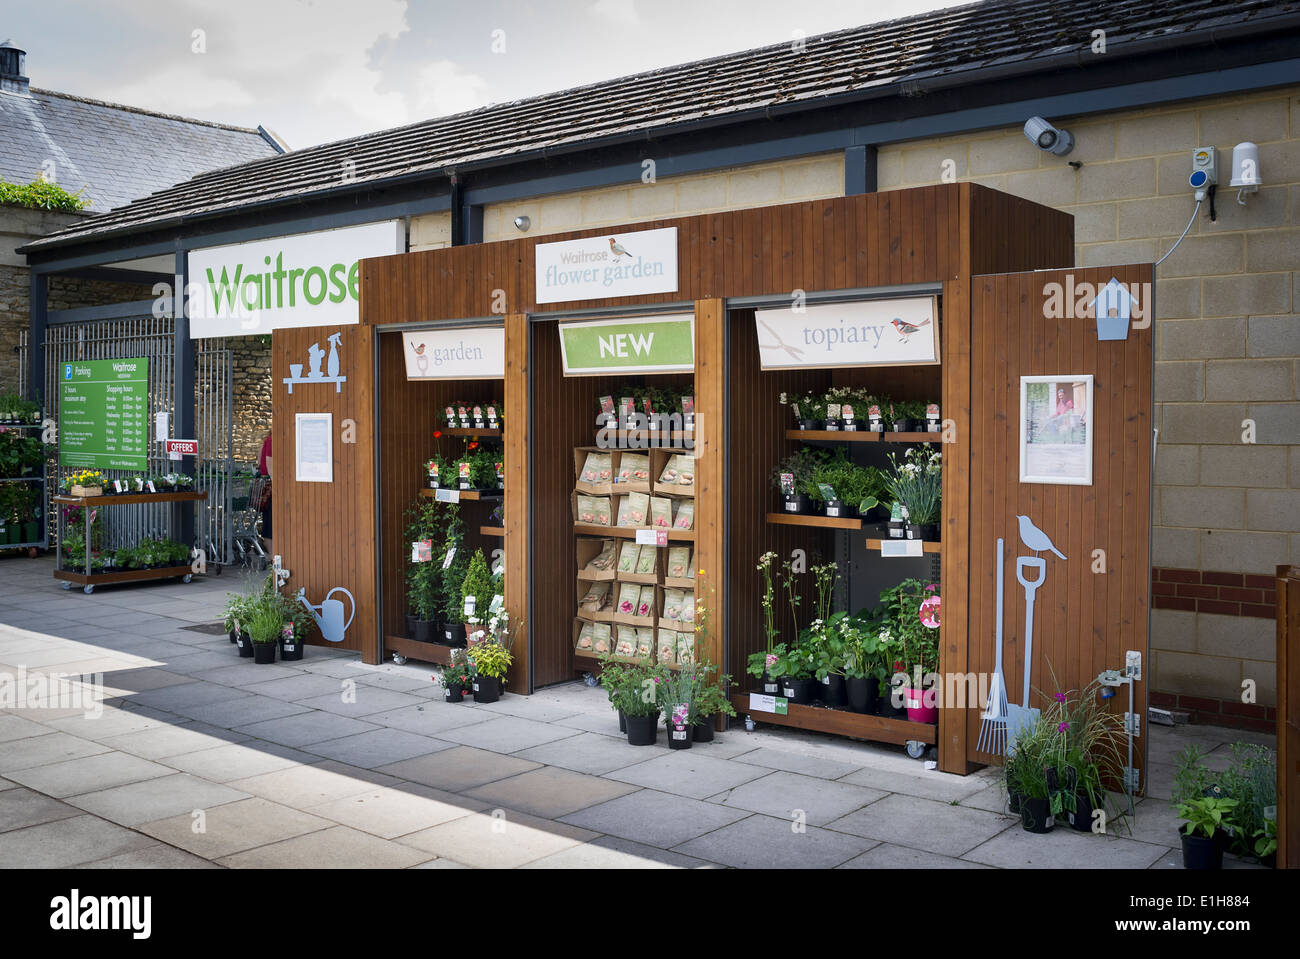 Waitrose flower garden supply point at an English supermarket - Stock Image